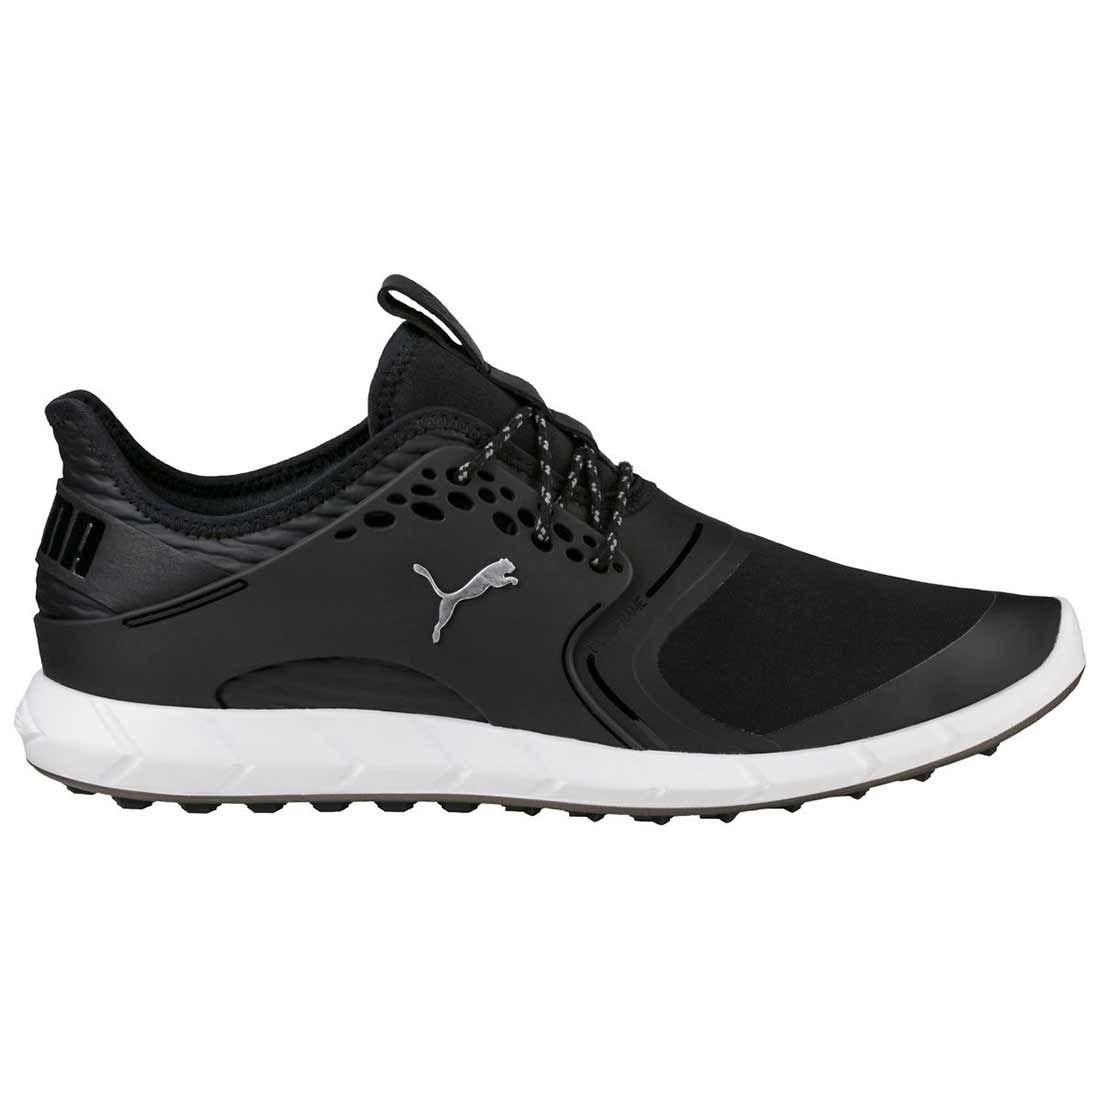 Puma Ignite PWRSPORT Golf Shoes Black